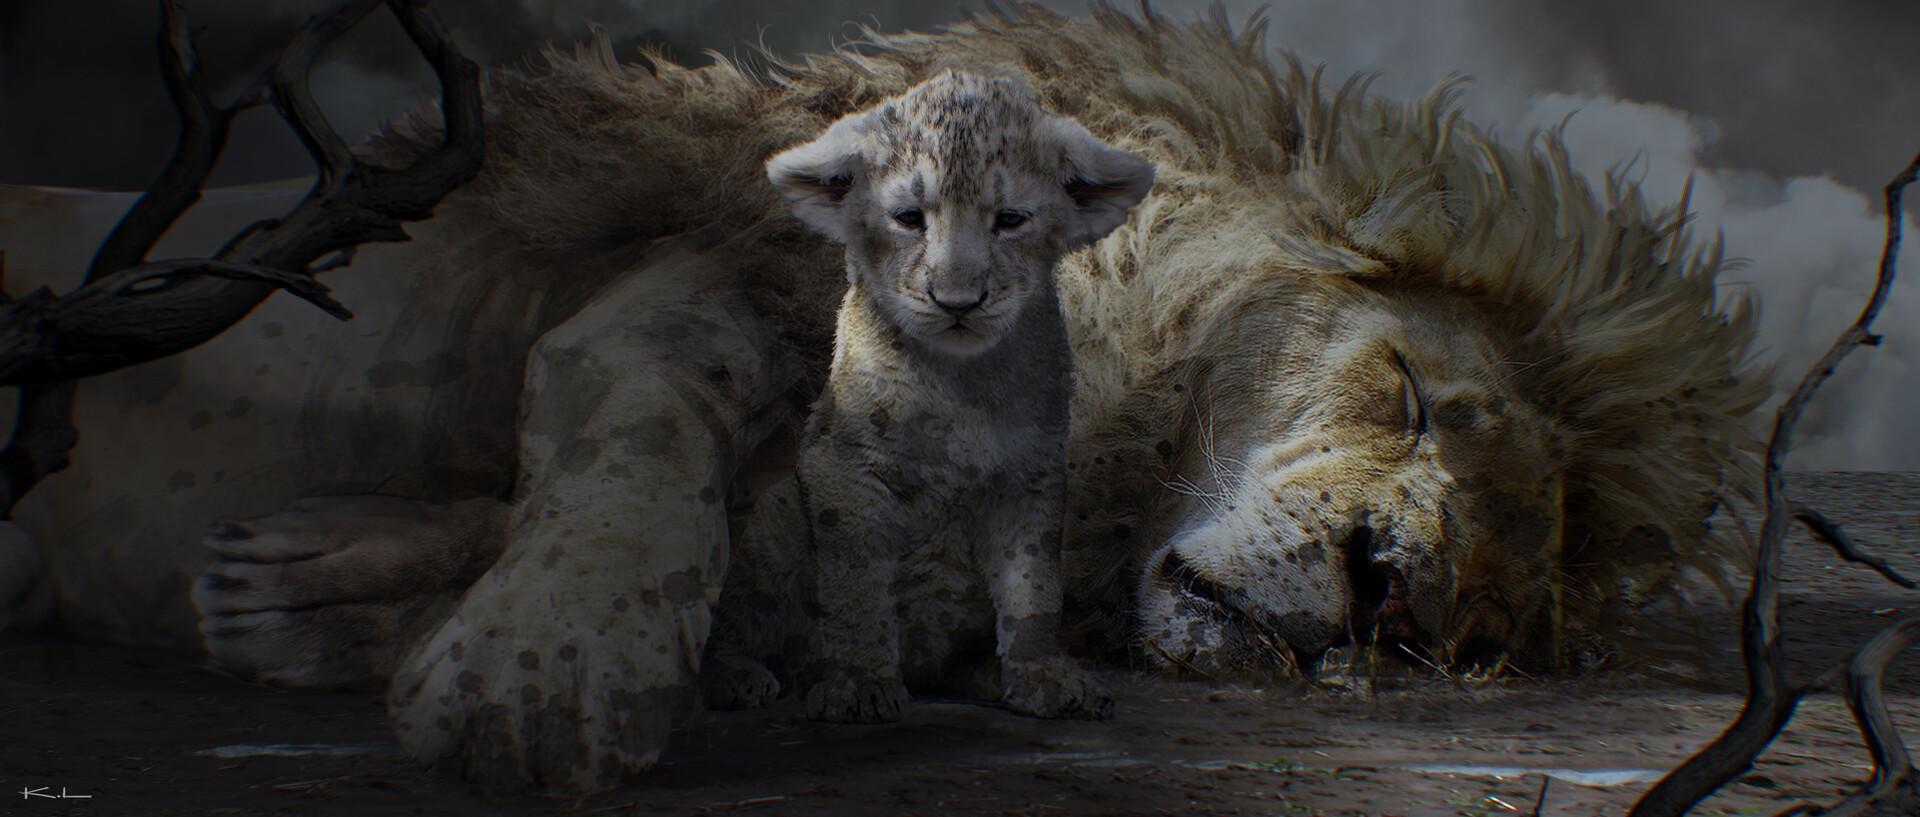 Artstation The Lion King 2019 Disney Karl Lindberg